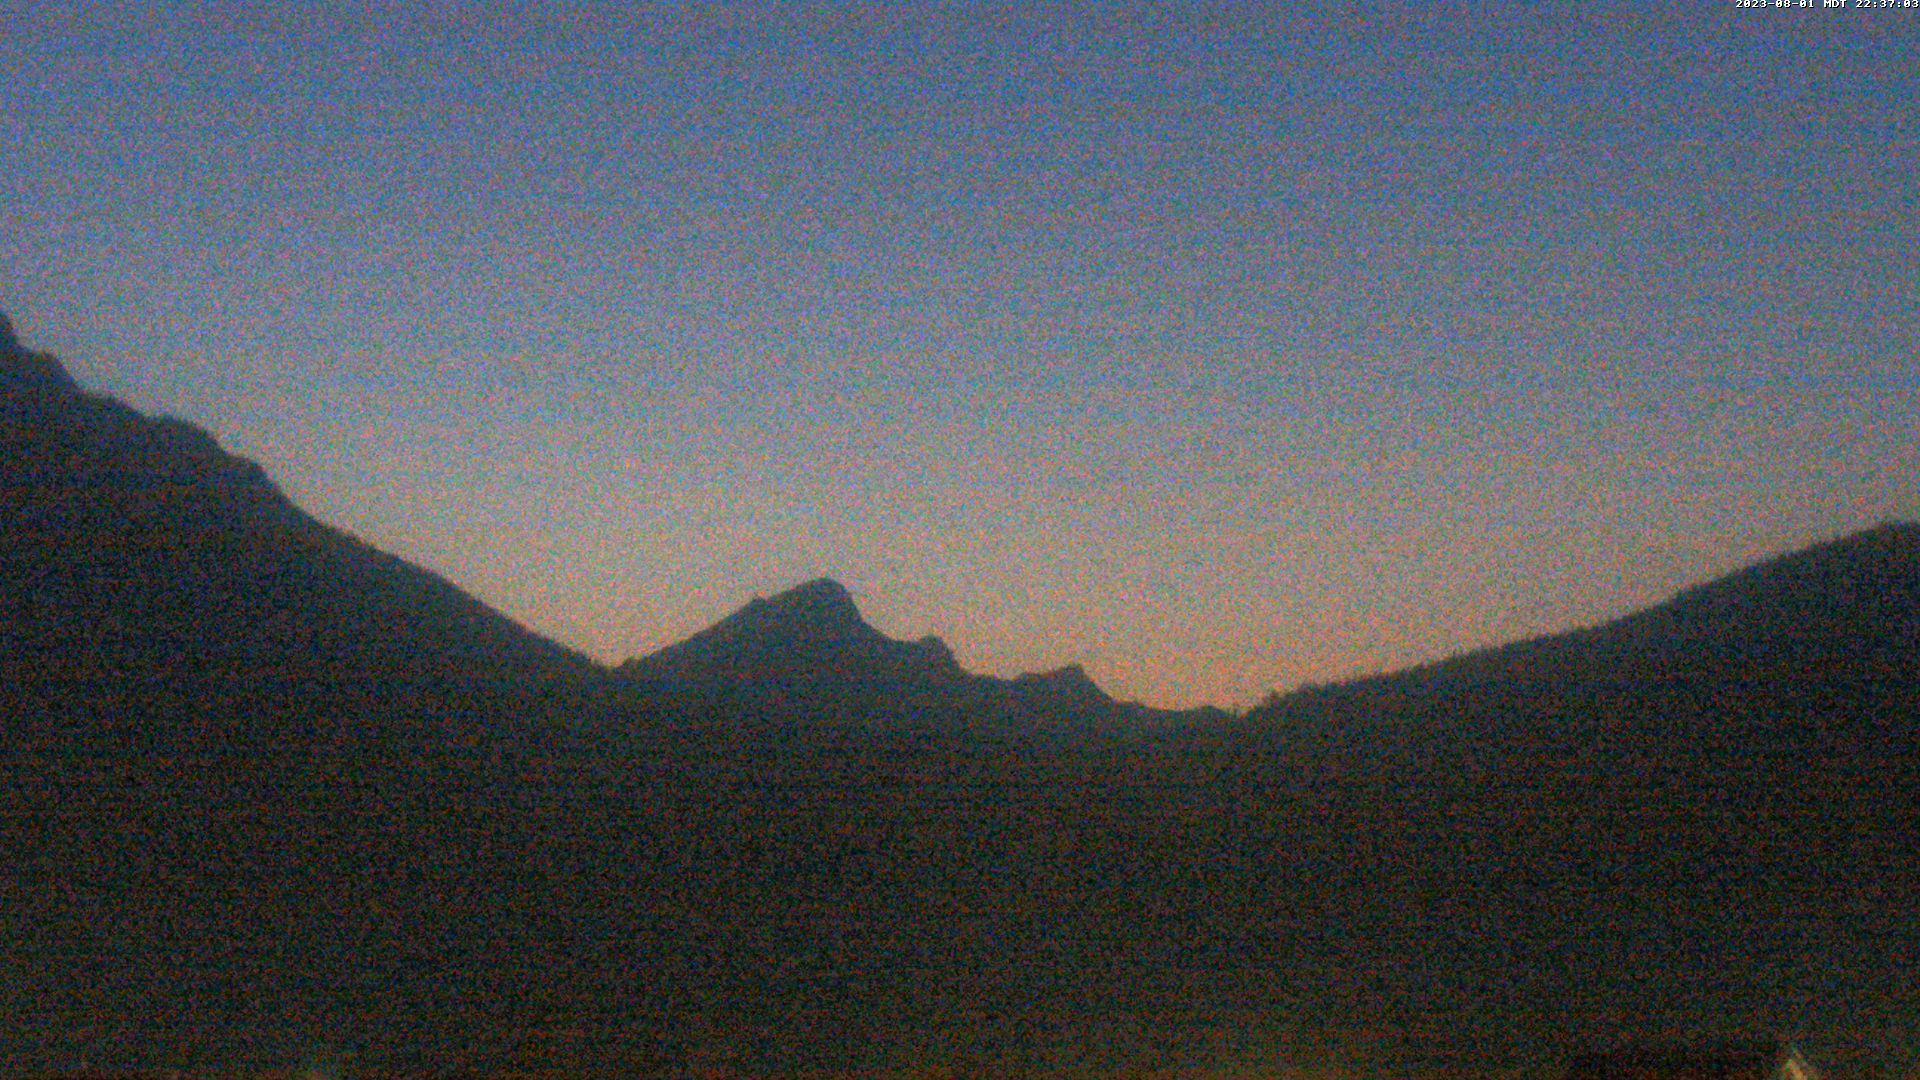 Webcam Mount Norquay